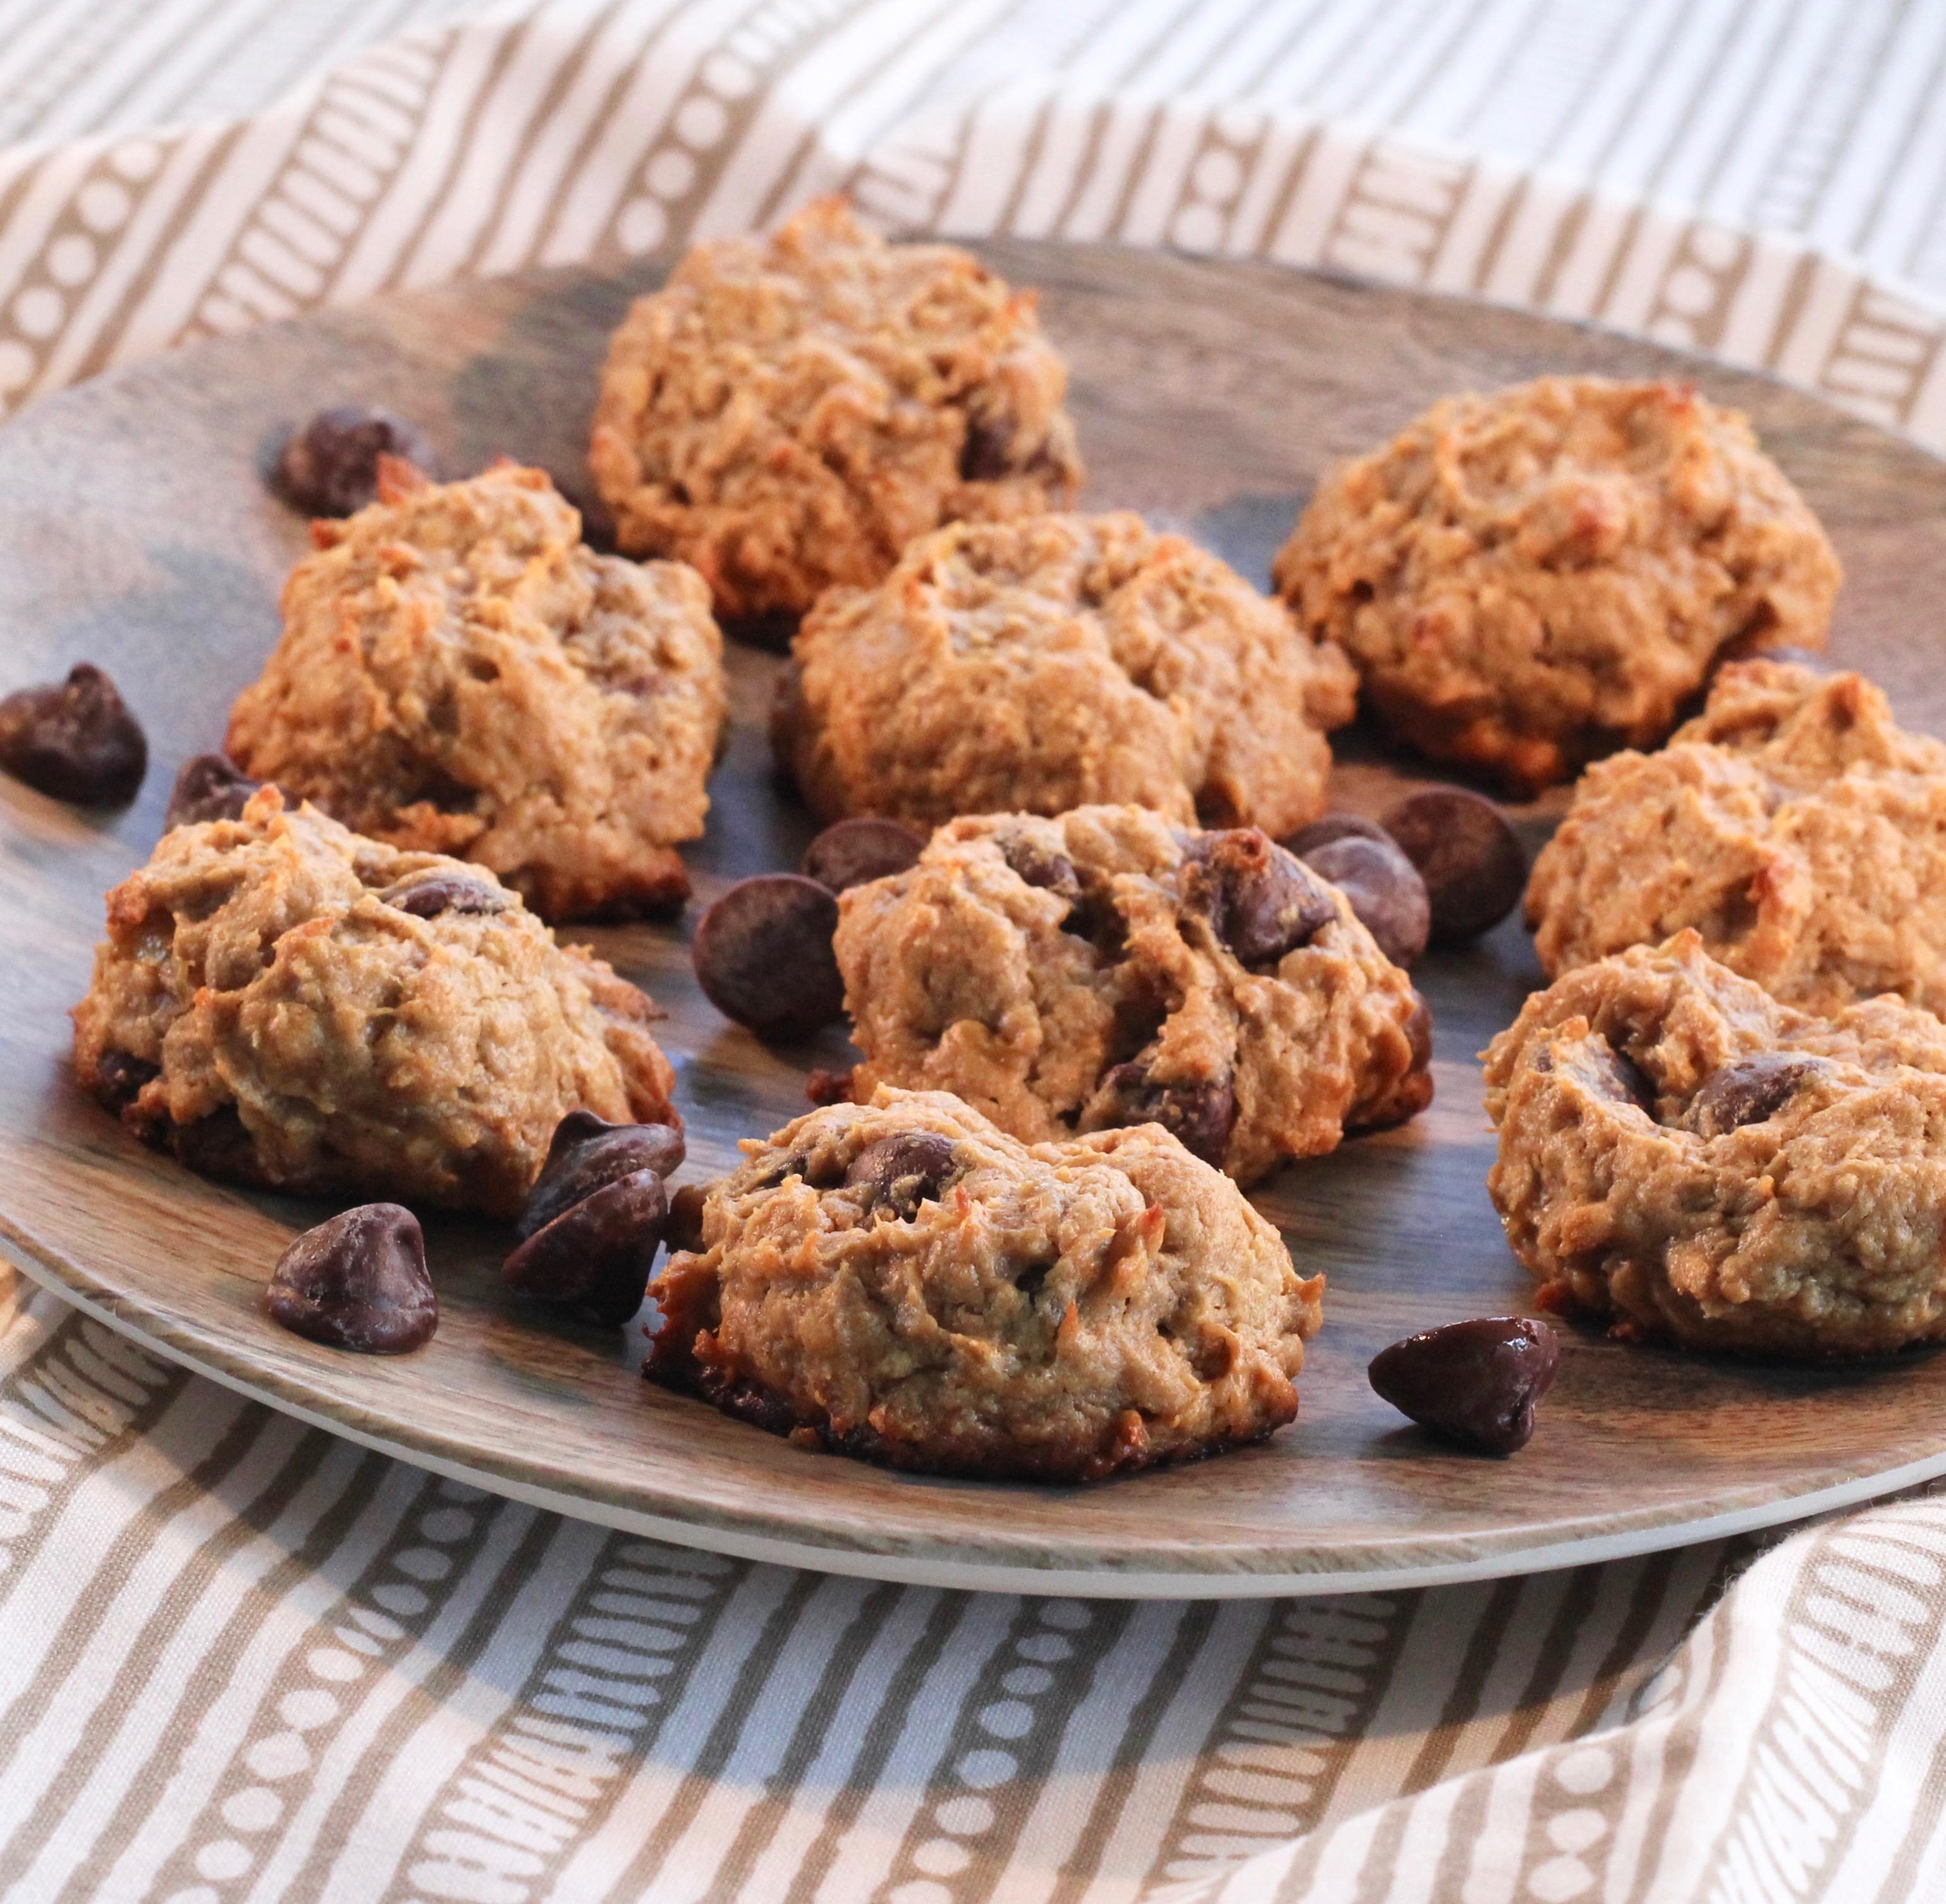 Peanut Butter-Banana Cookies